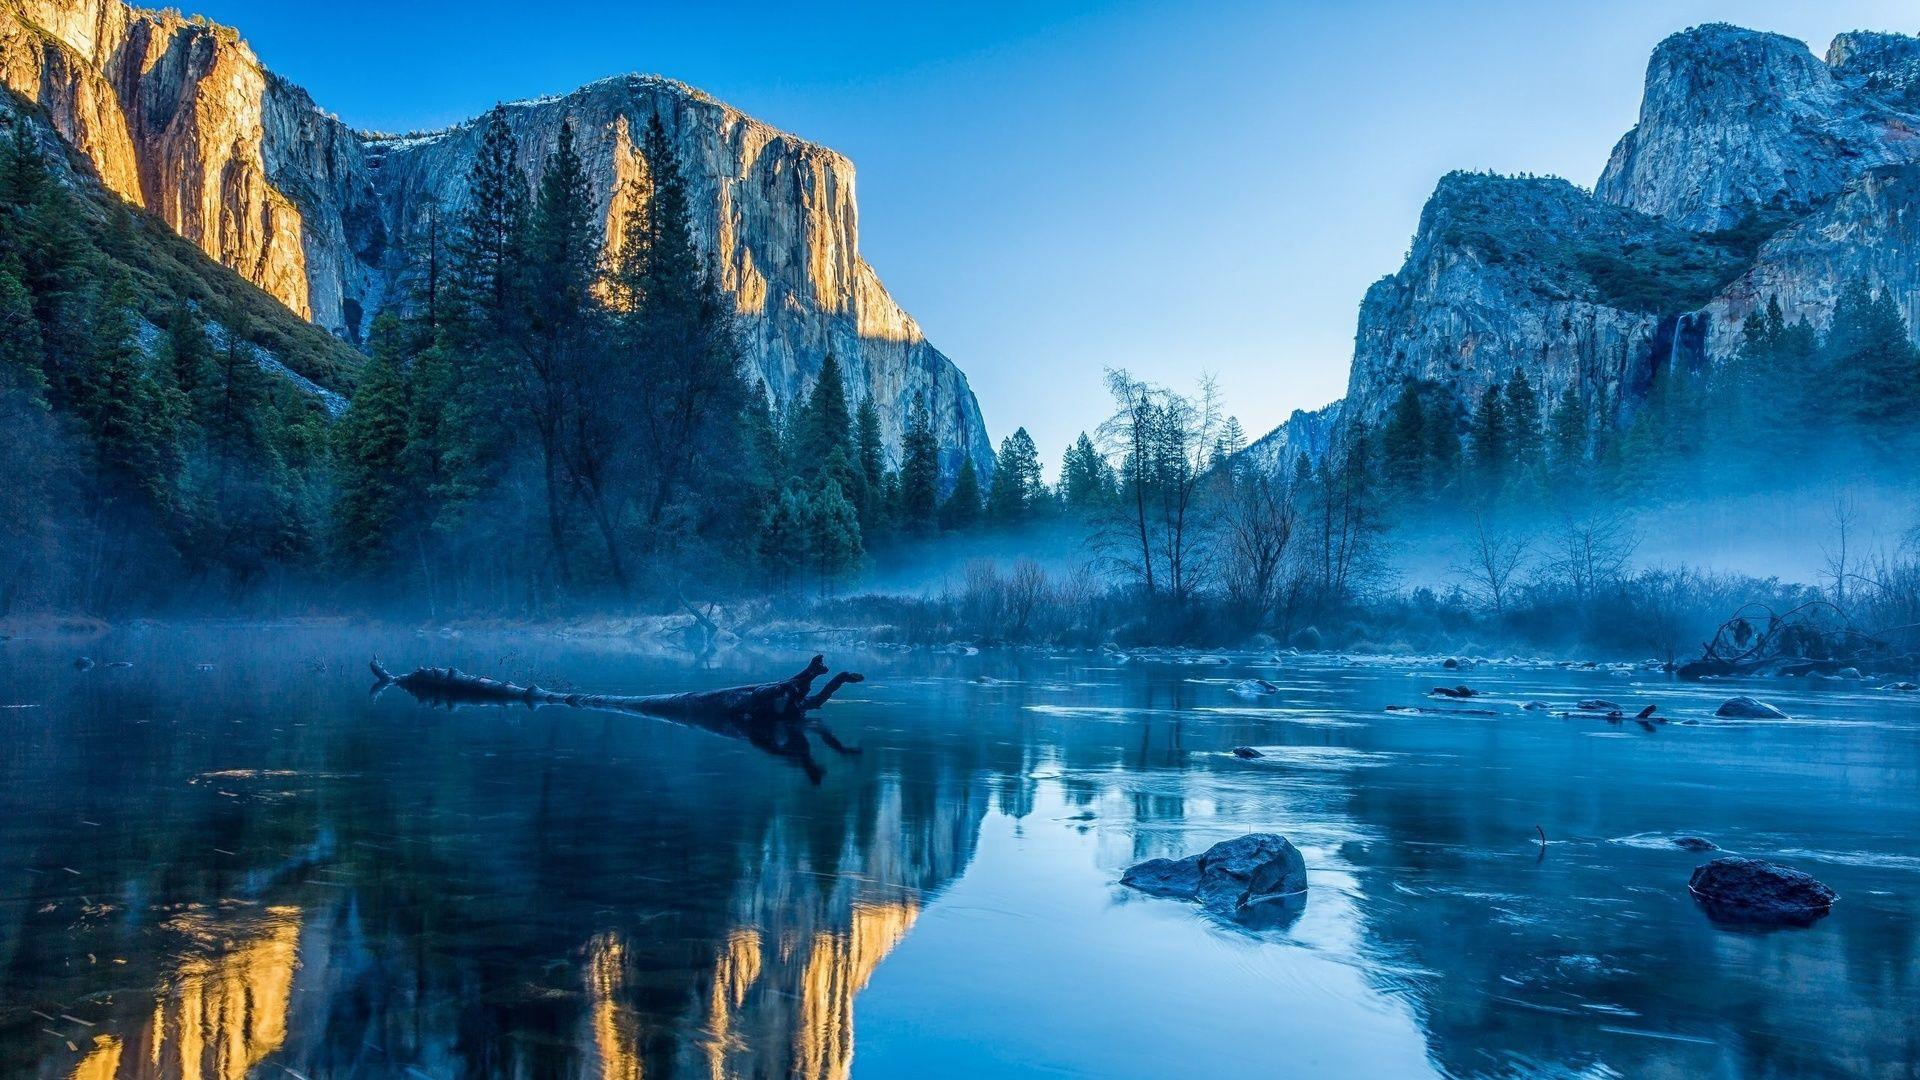 Yosemite new wallpaper